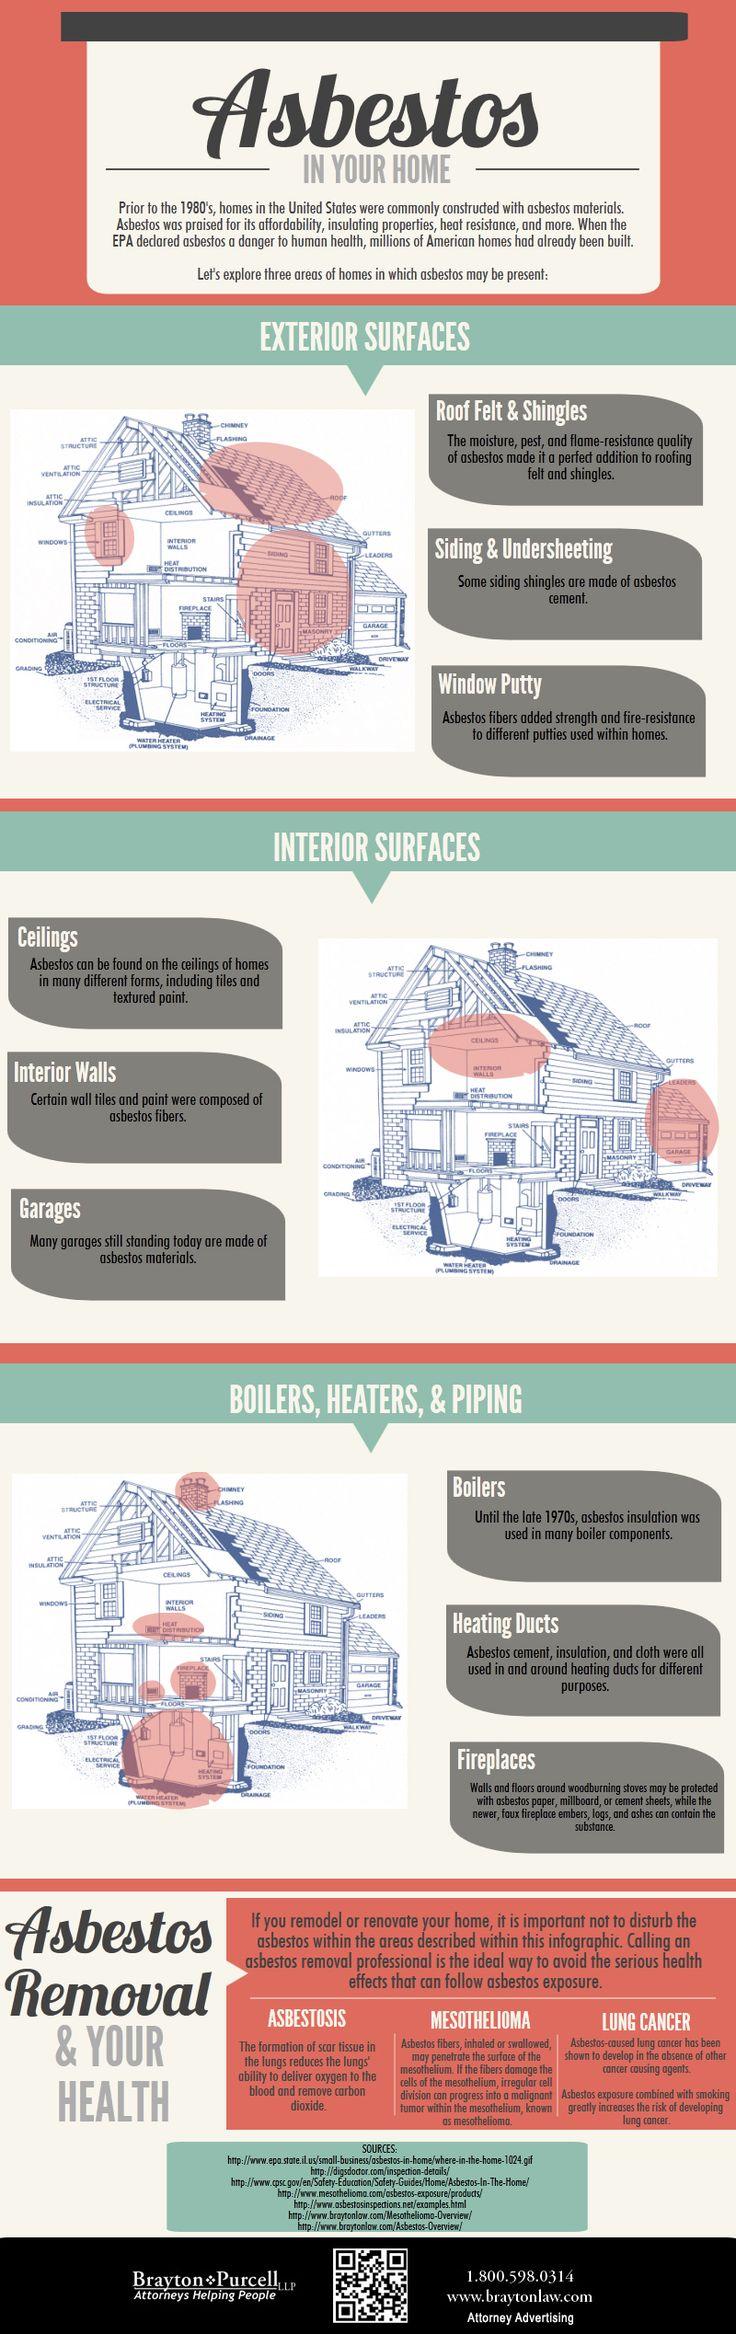 27 best Asbestos images on Pinterest | Building materials ...